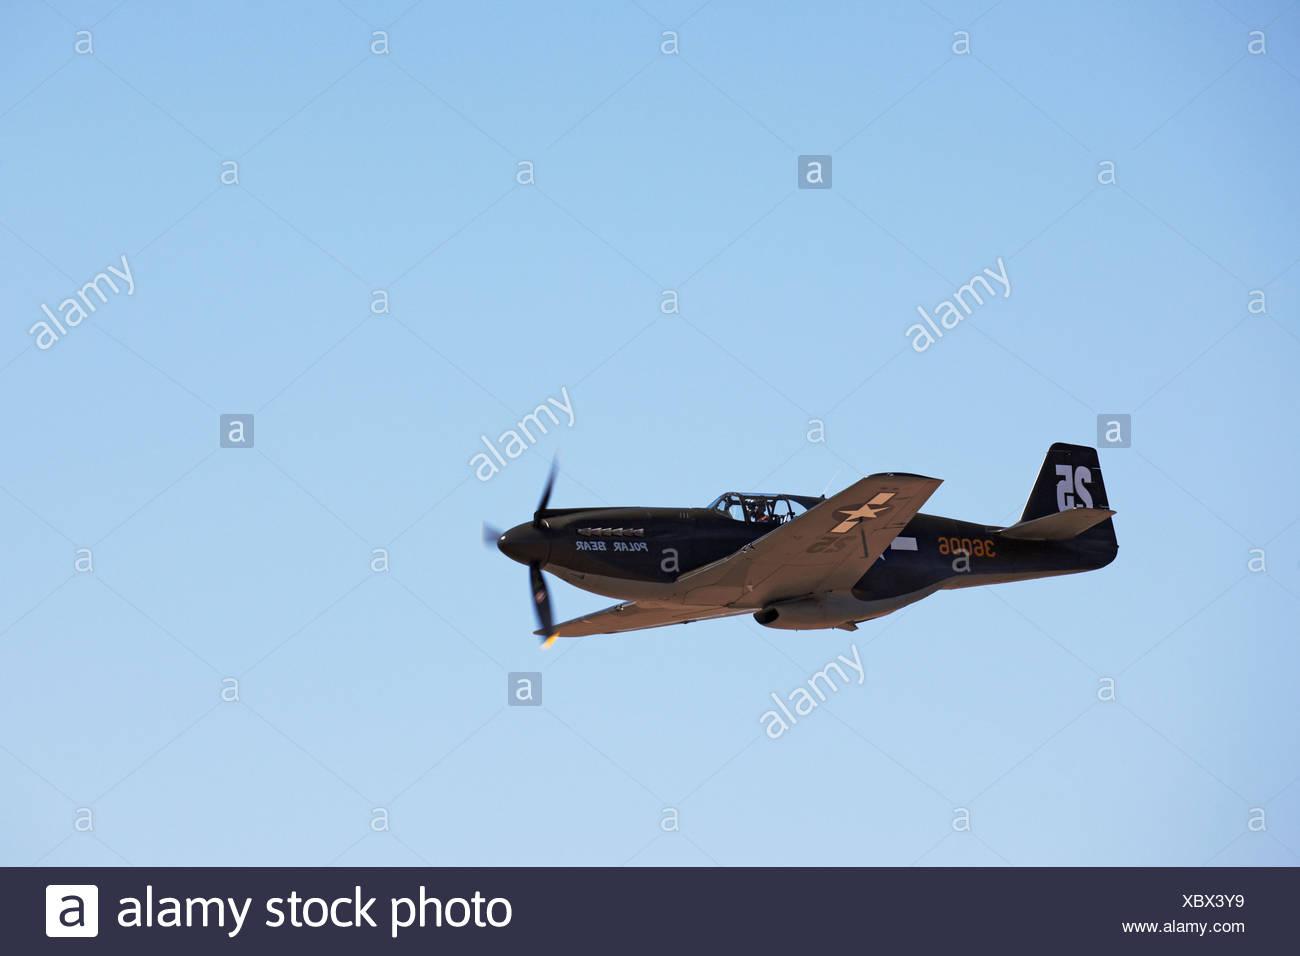 North American P-51 Mustang - Stock Image